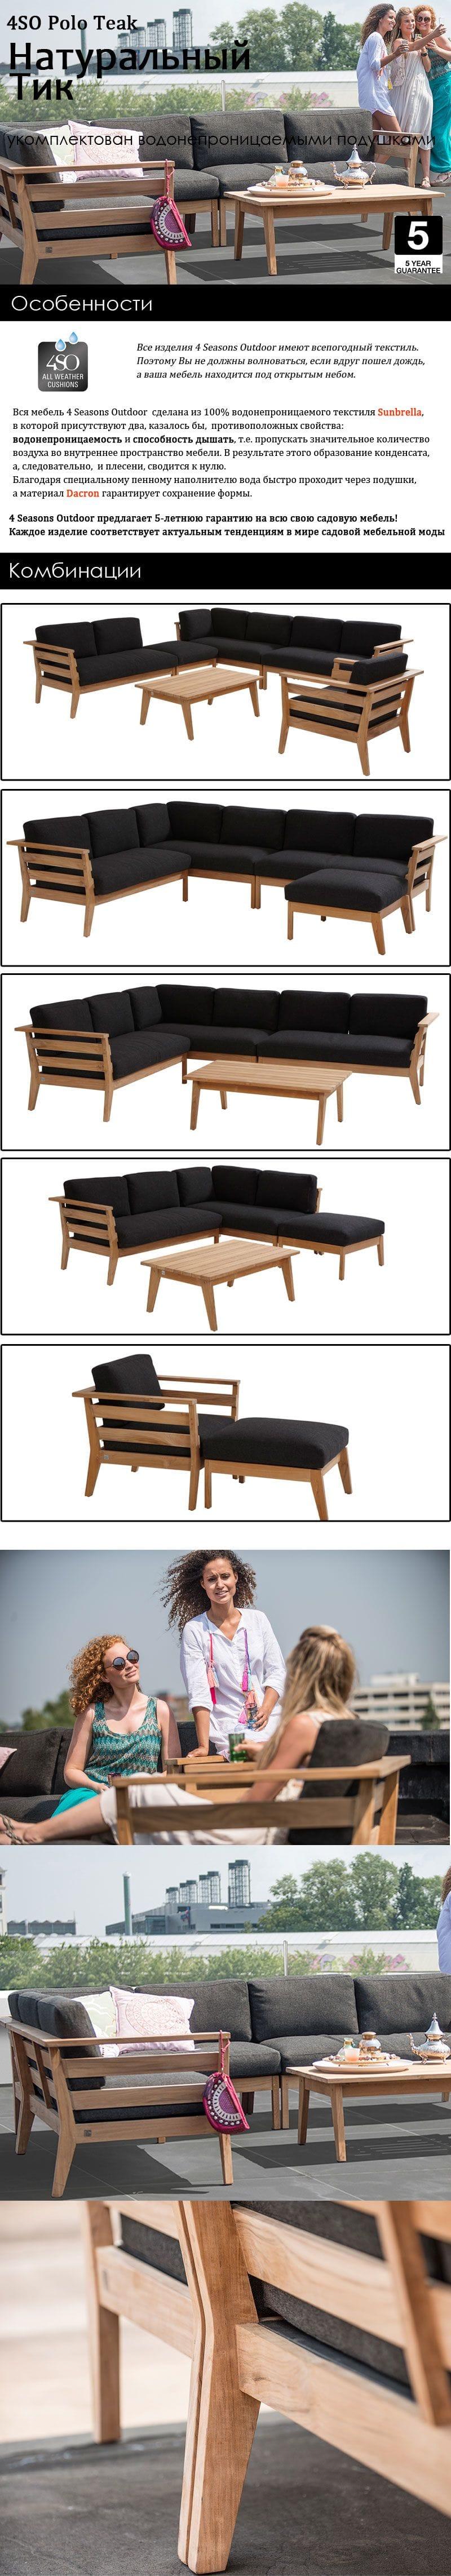 polo-lounge